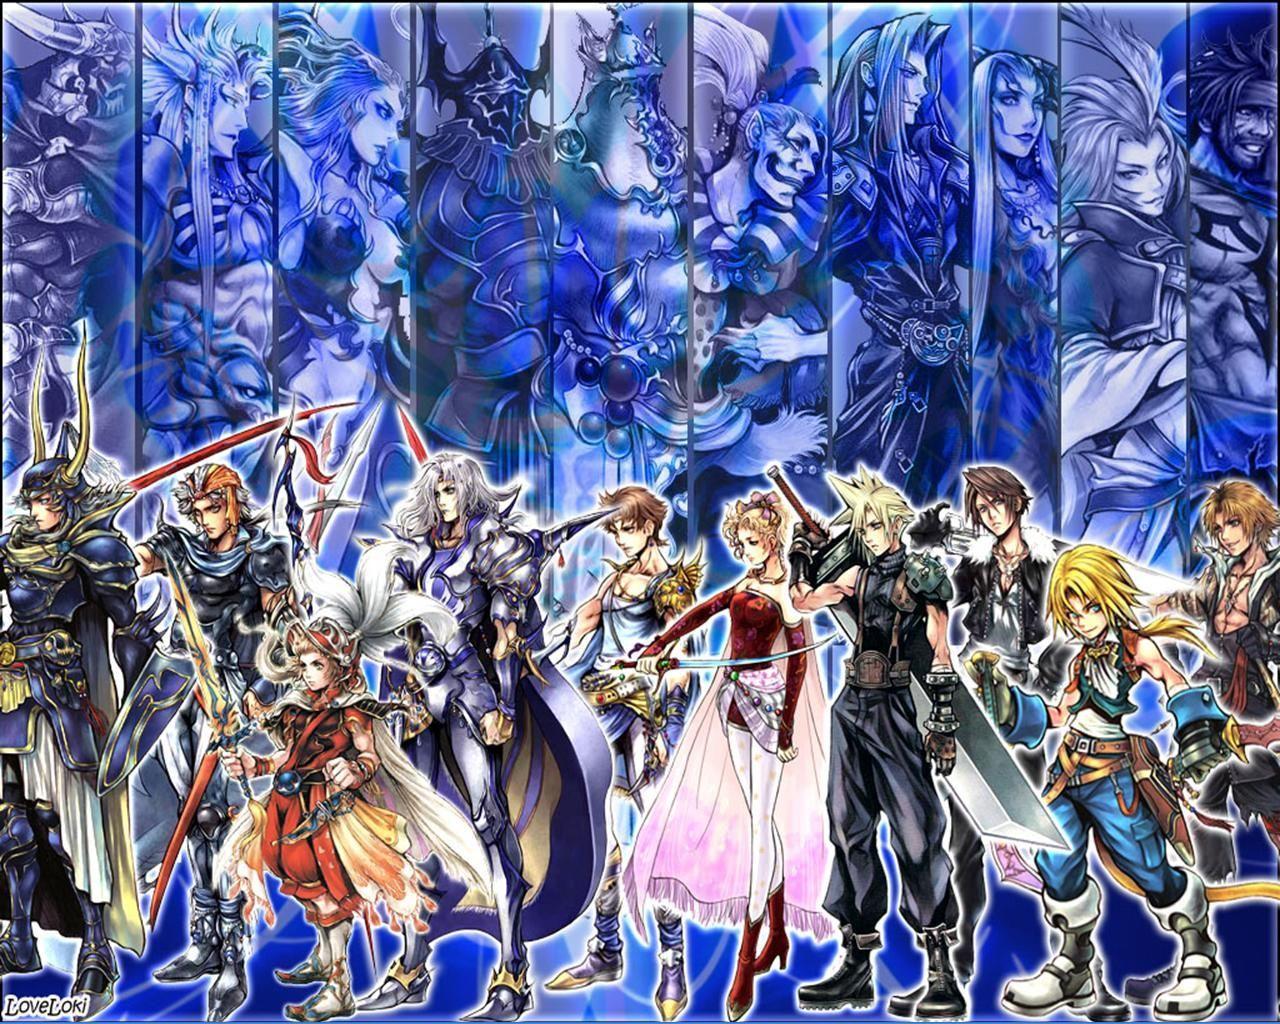 9088 - ¿Cuánto sabes de Final Fantasy? [Parte 2]